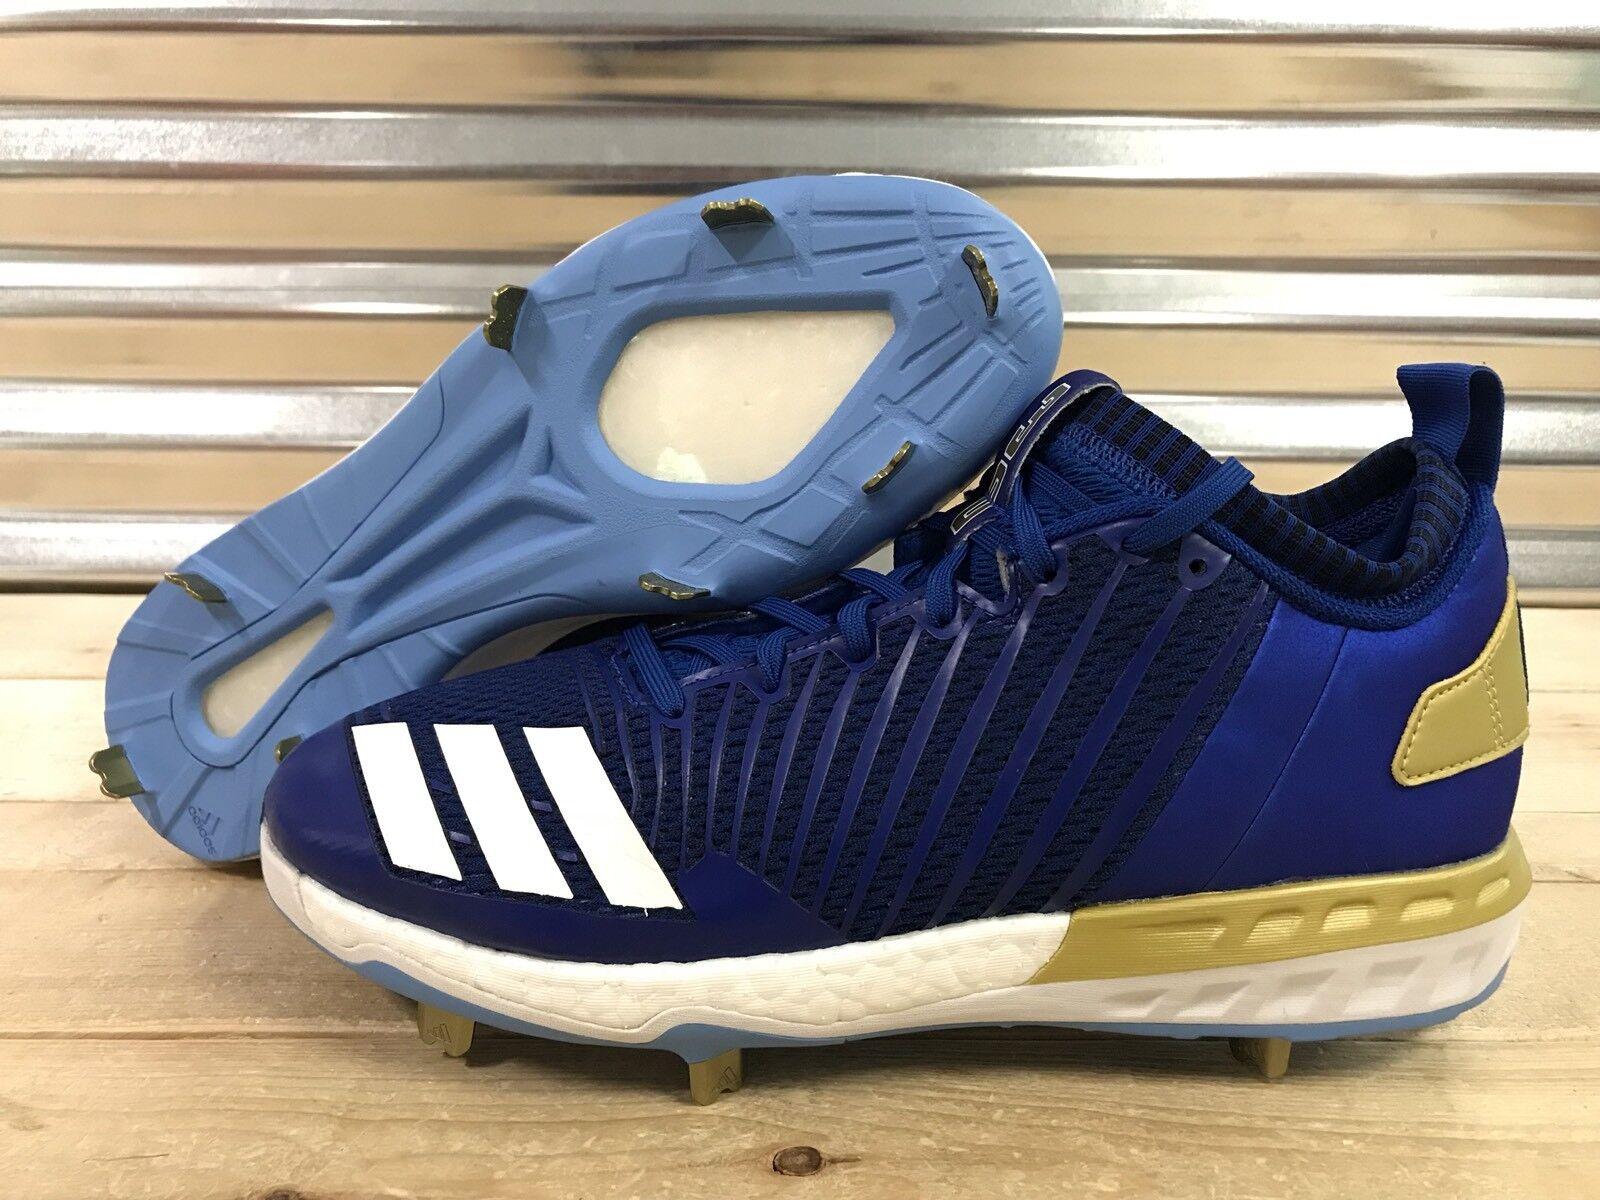 Adidas Boost Icon 3 Yordano Ventura 30 PE Baseball Cleats Royals gold ( CG5499 )